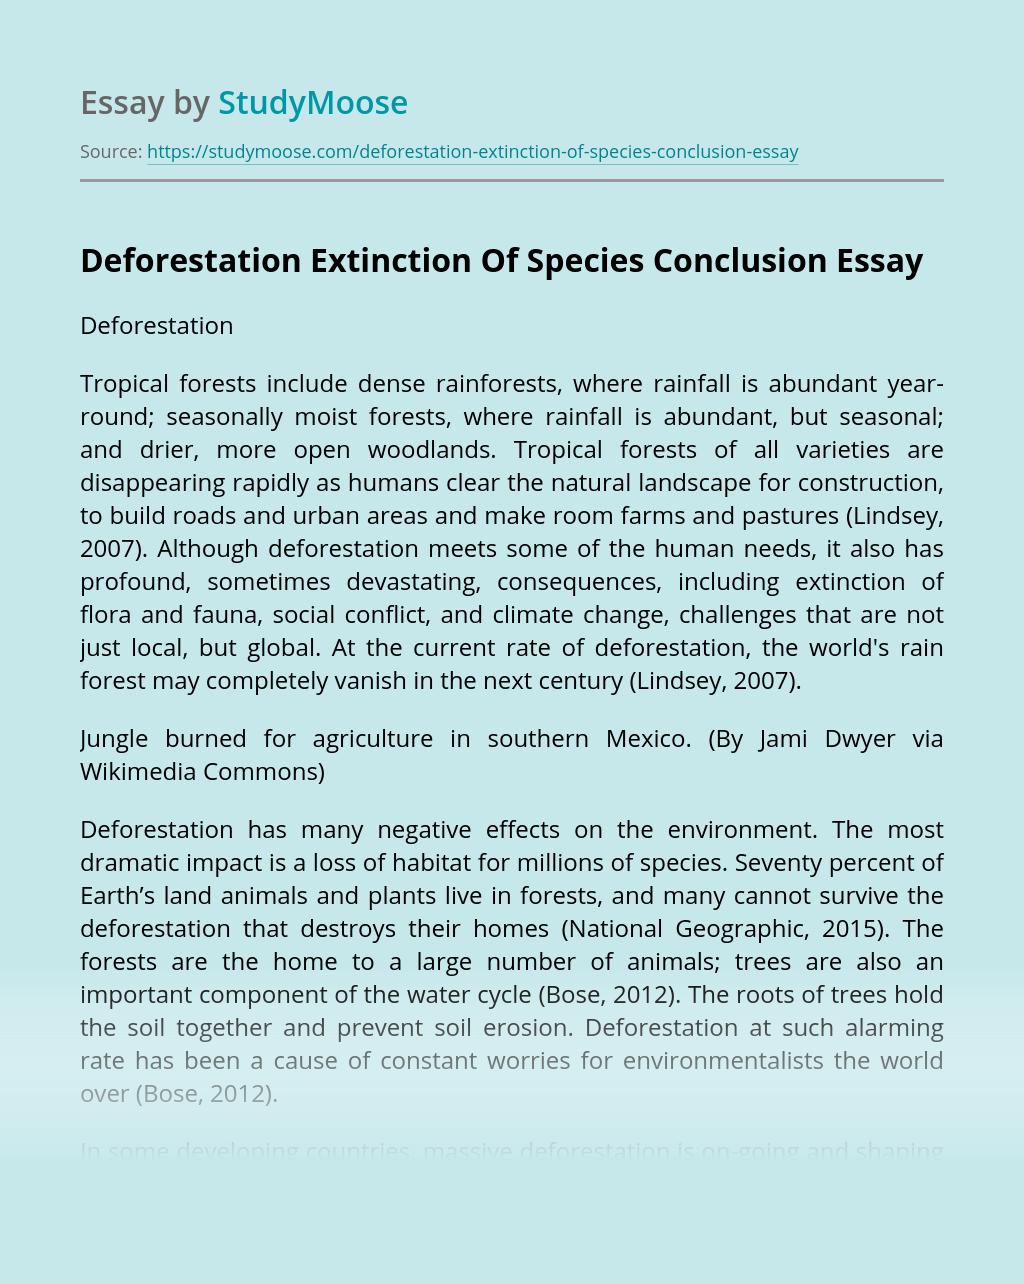 Deforestation Extinction Of Species Conclusion